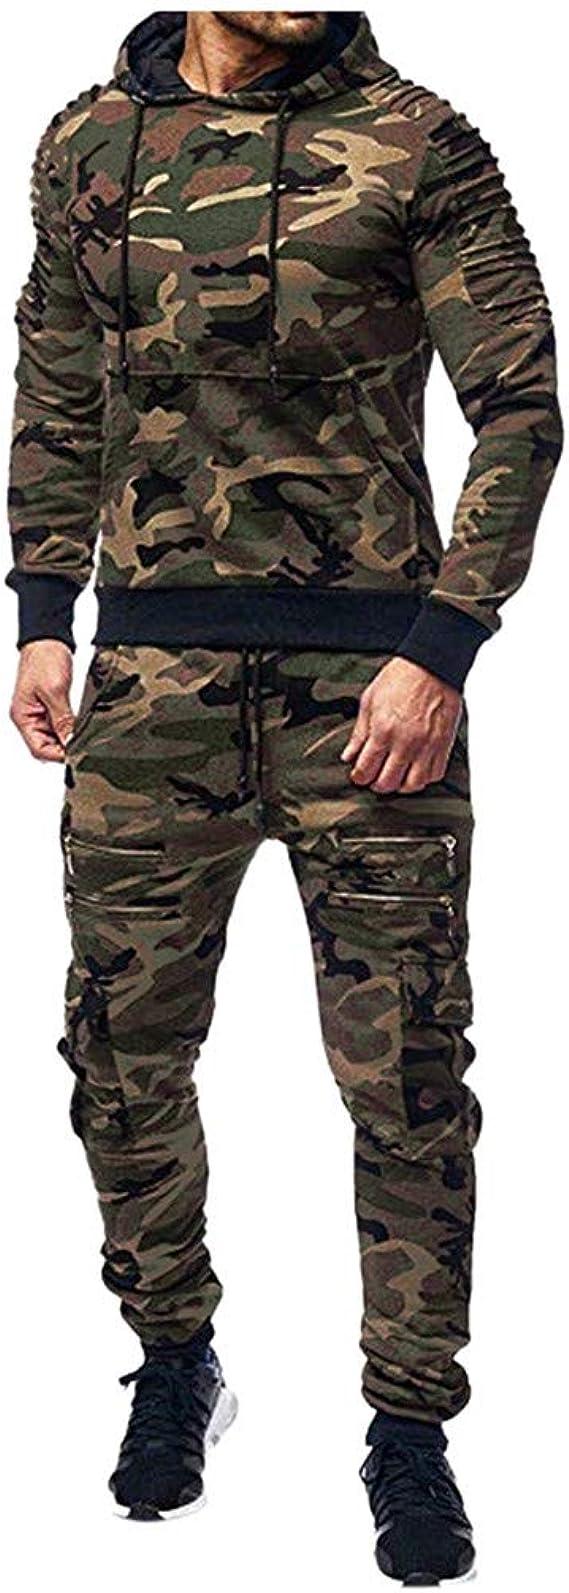 Mens Tracksuit Set Camouflage Sweatshirt Jogger Sweatpants Solid Patchwork Camo Warm Sportswear